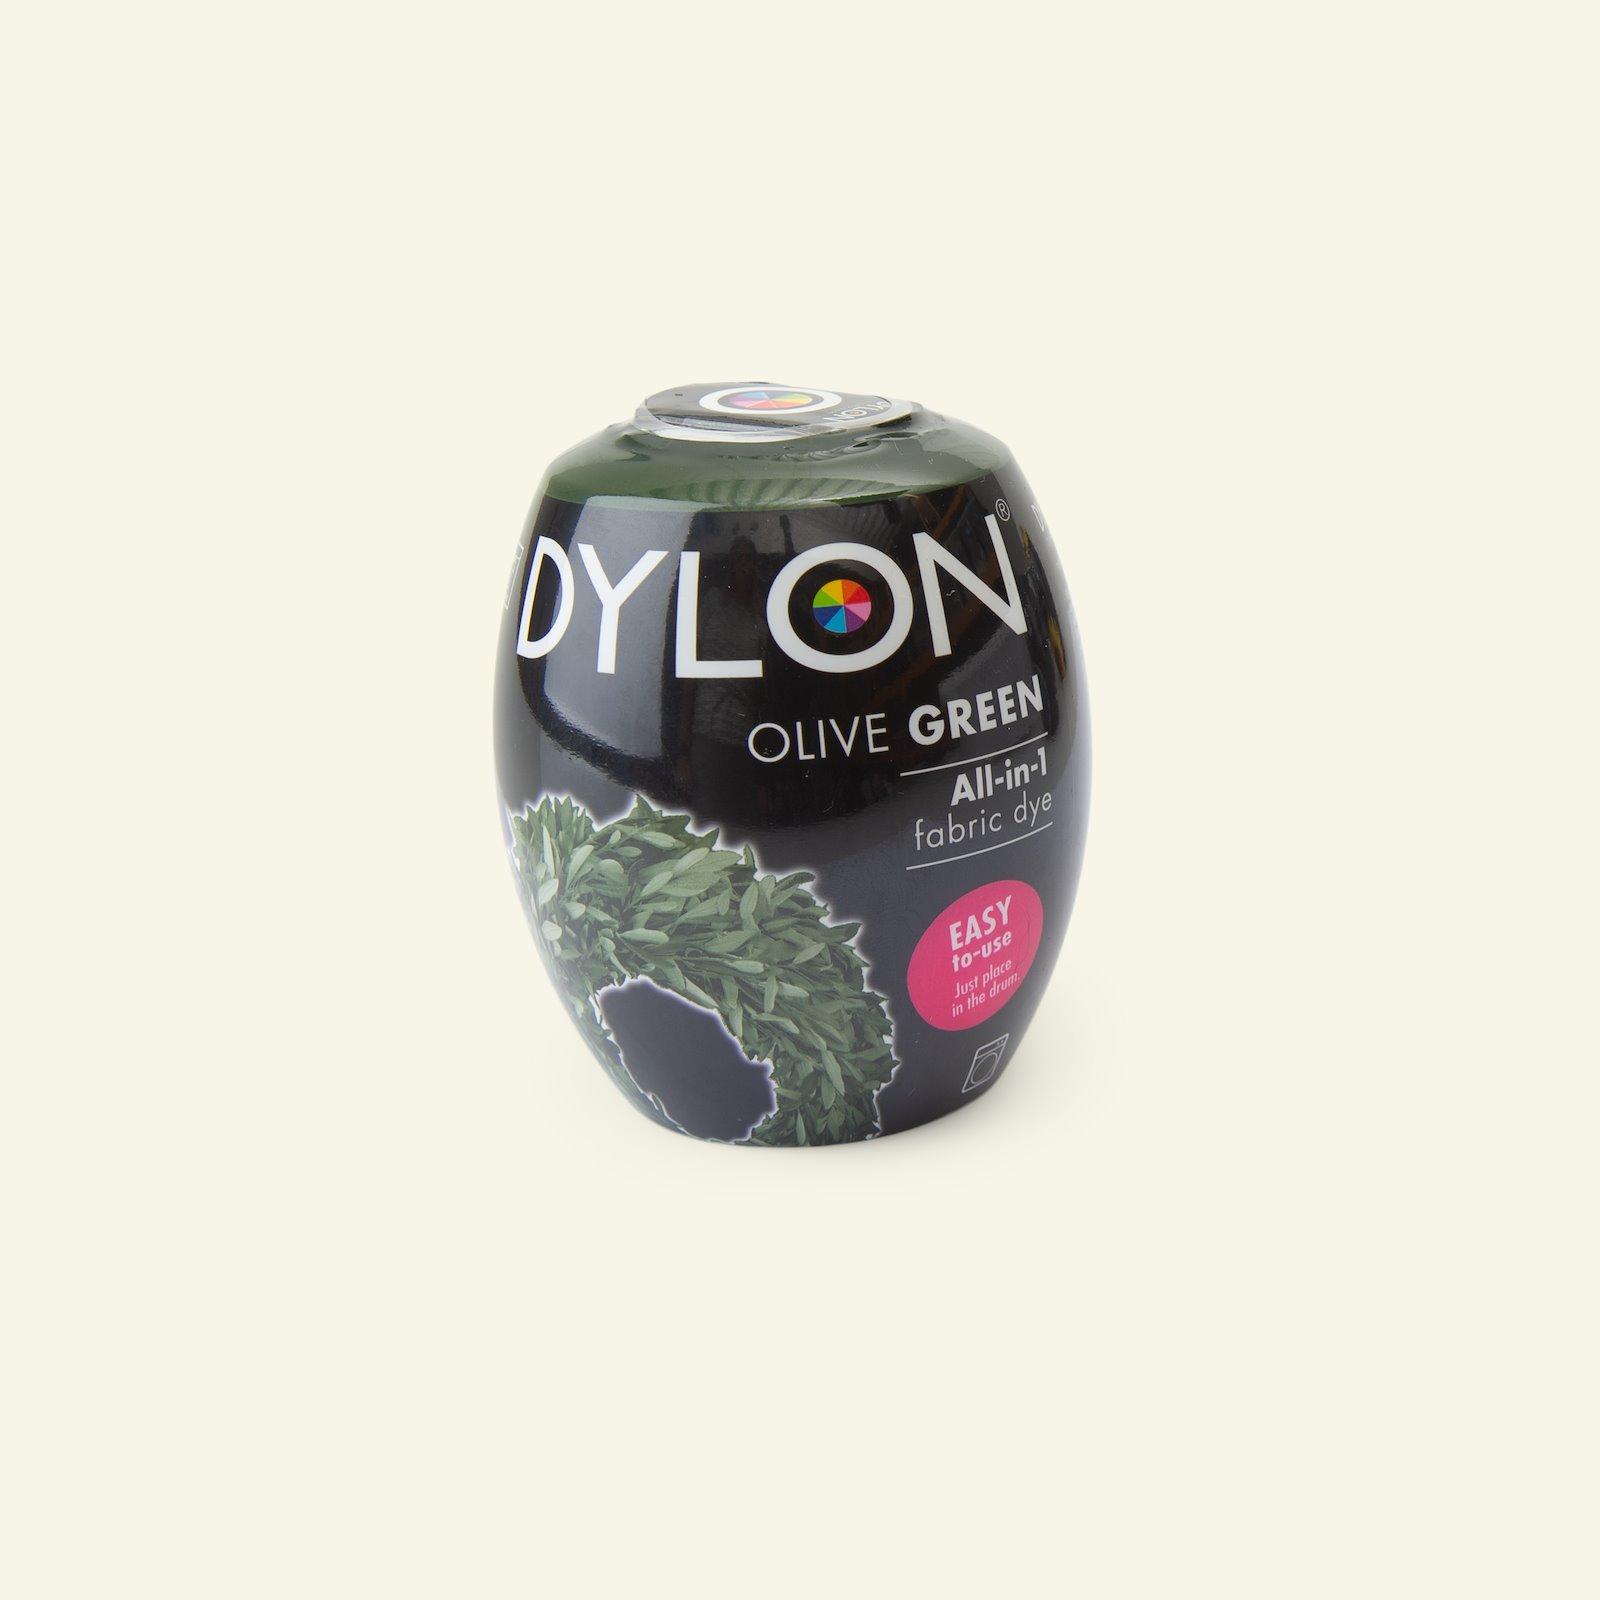 Dylon Maschinenfarbe, Grün 29709_pack_b